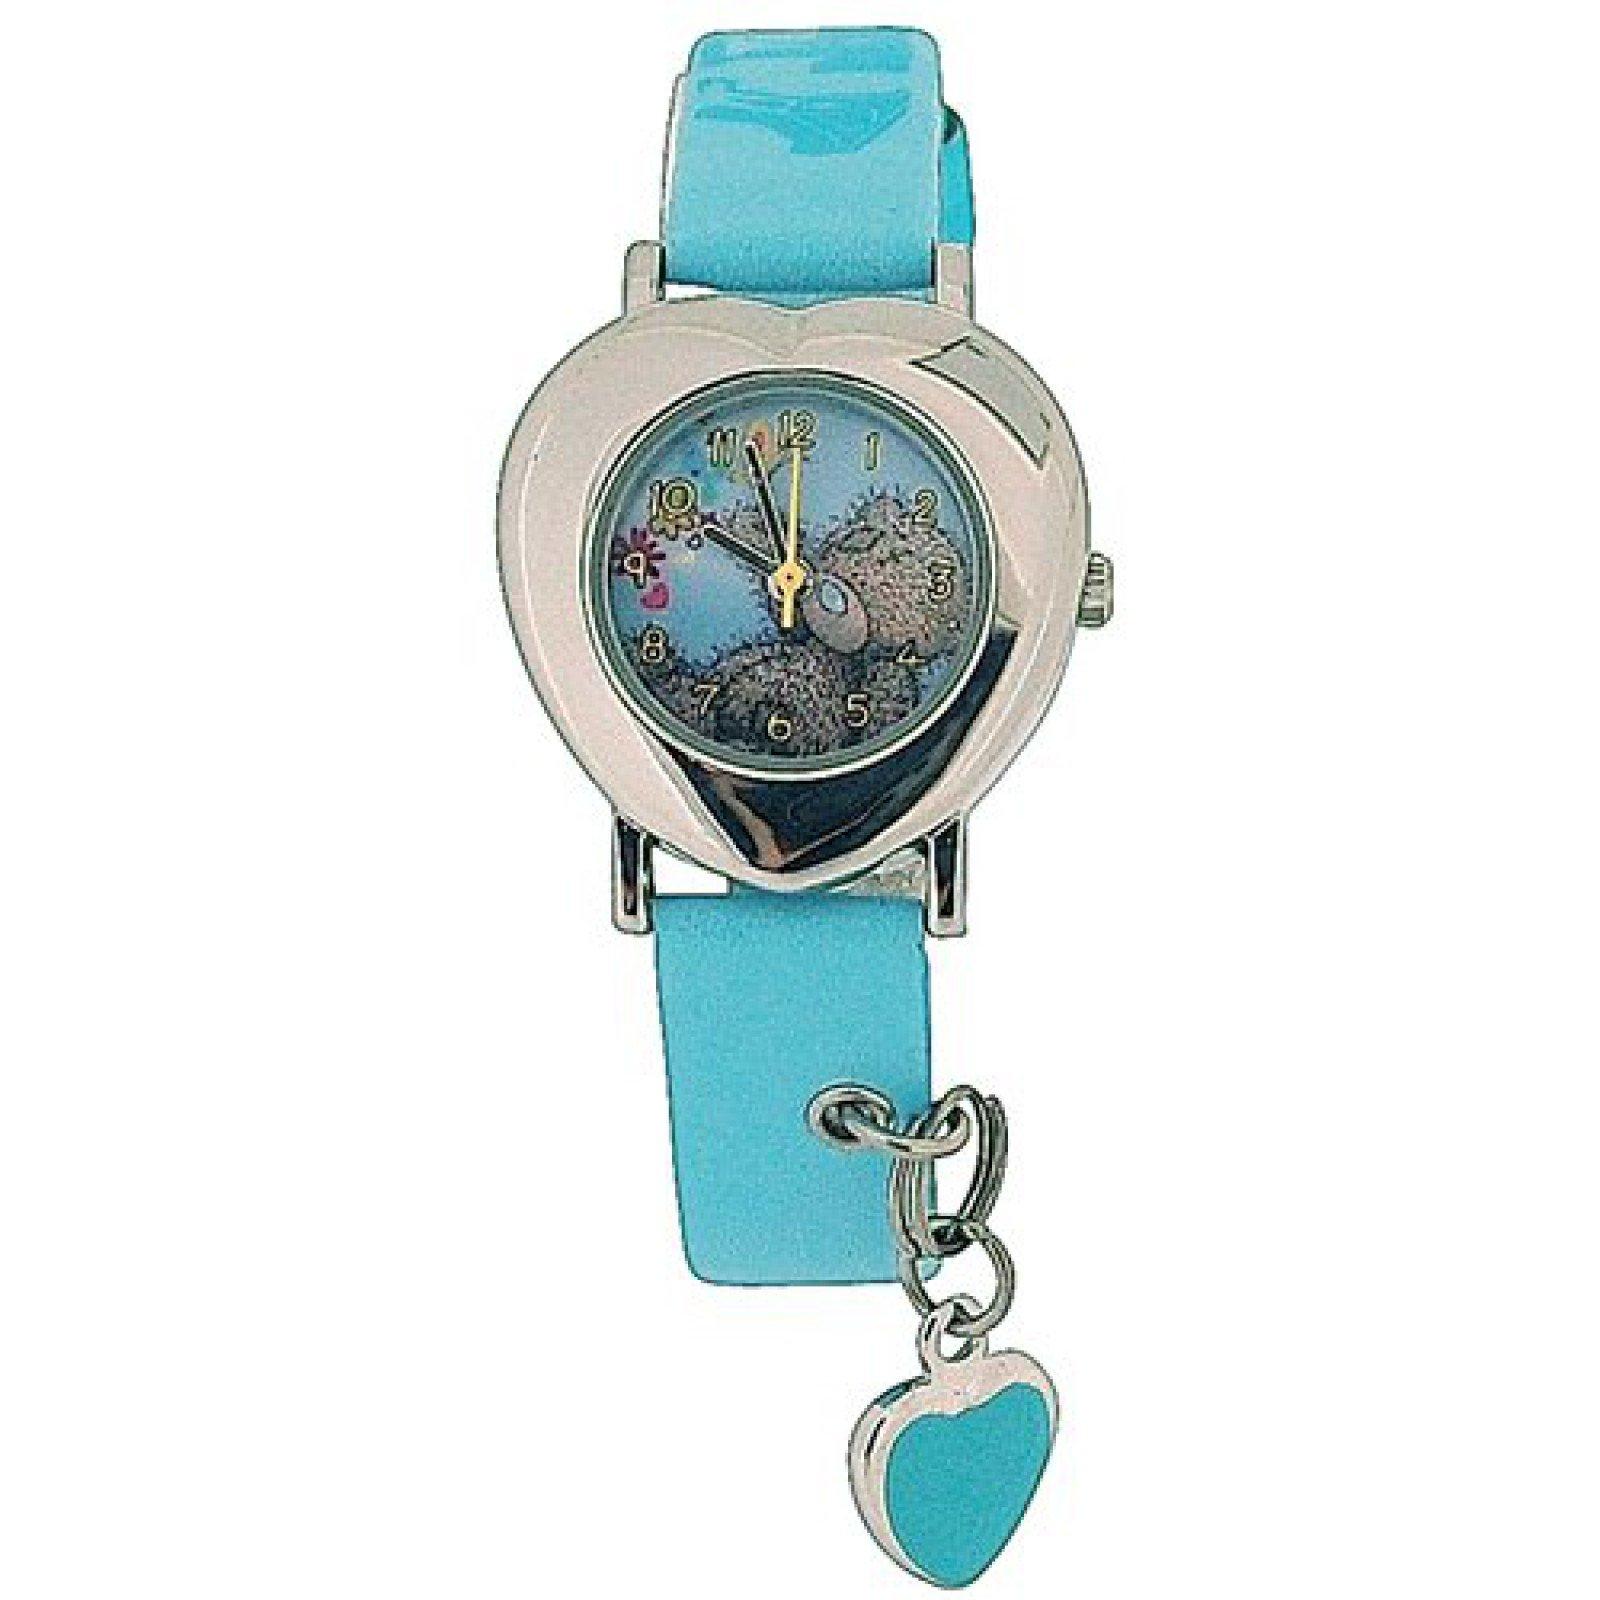 Childrens-Girls Analogue Me To You Tatty Teddy Blue Strap Watch With Charm MTY3B